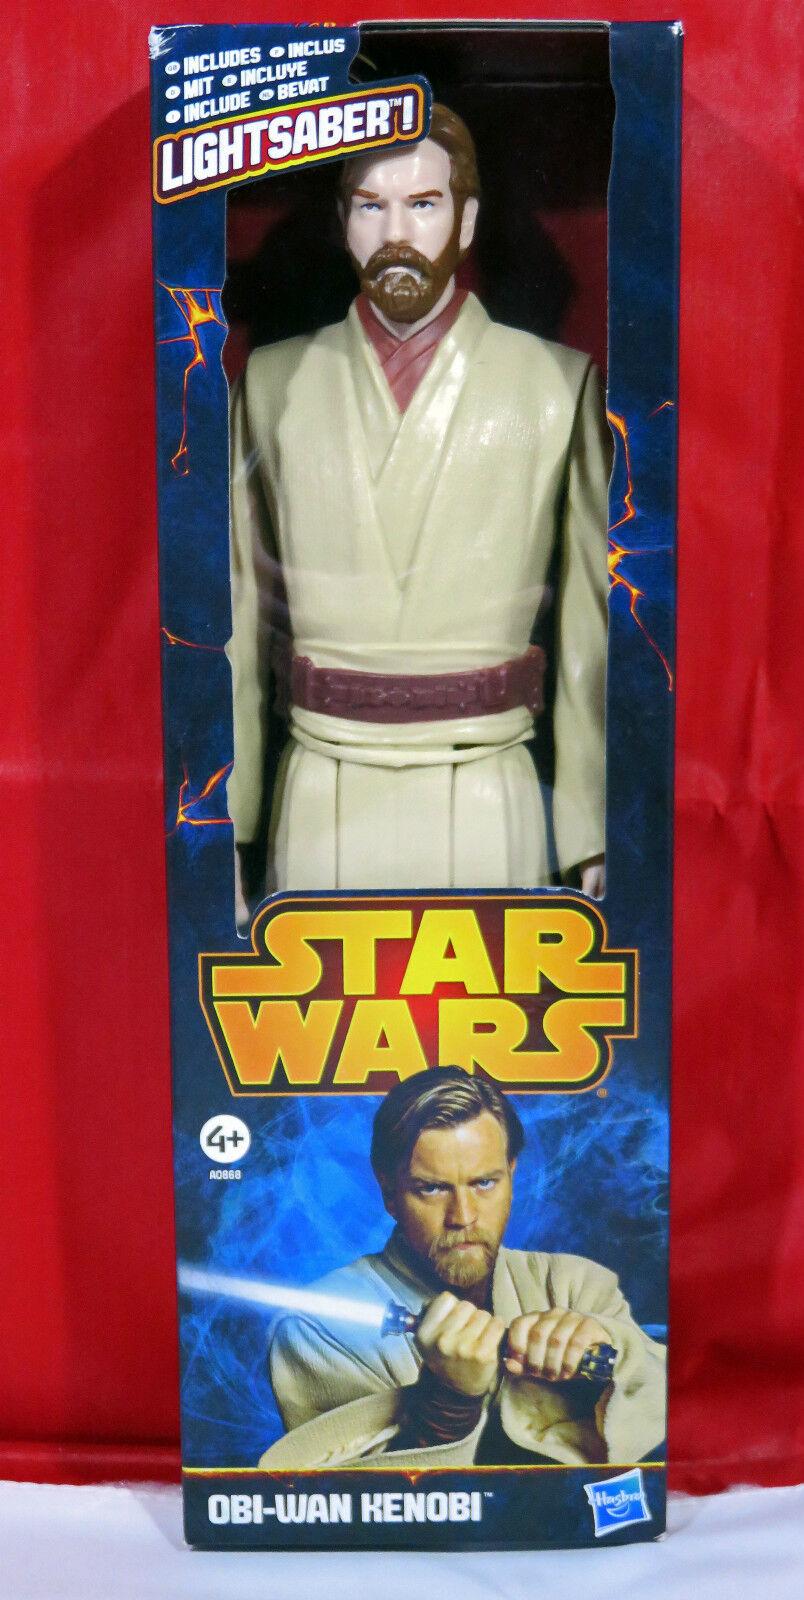 STAR WARS 12'' Inch Obi-Wan Kenobi Action Figure & Lightsaber Hasbro A0868 NMIB